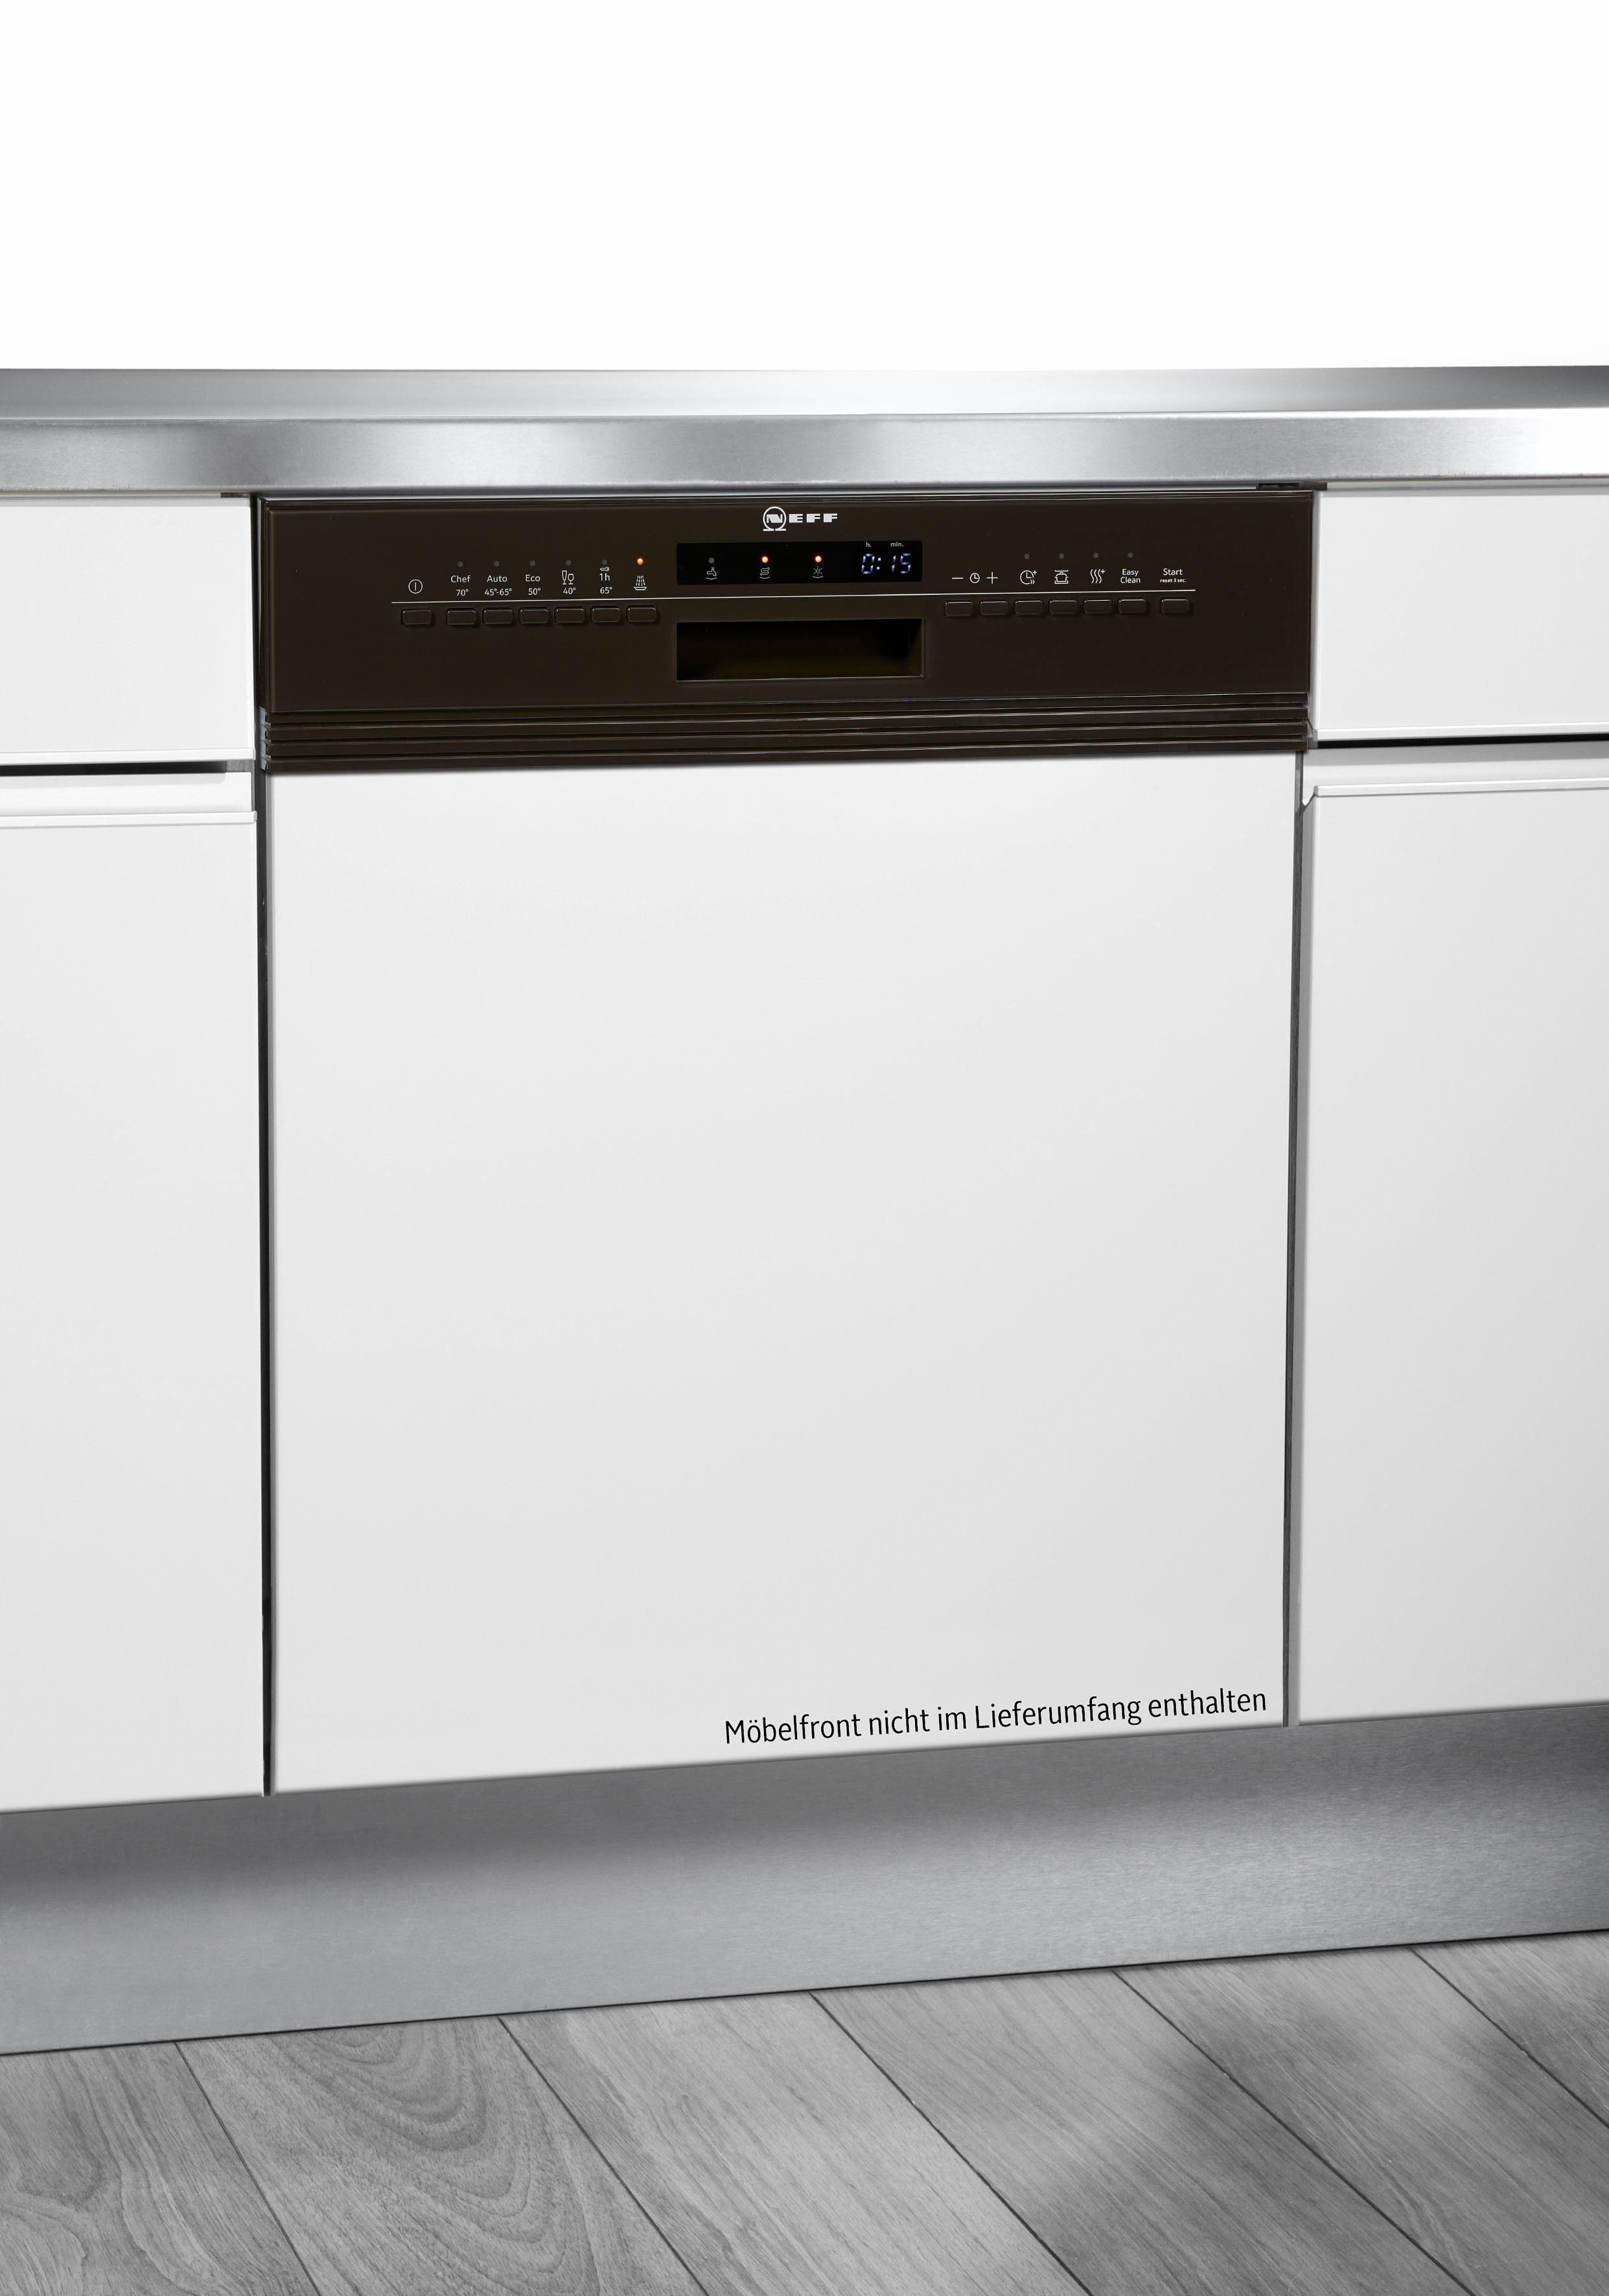 NEFF teilintegrierbarer Geschirrspüler Serie 4, Serie 4 GI4603IB / S413I60M3E, 9,5 l, 13 Maßgedecke